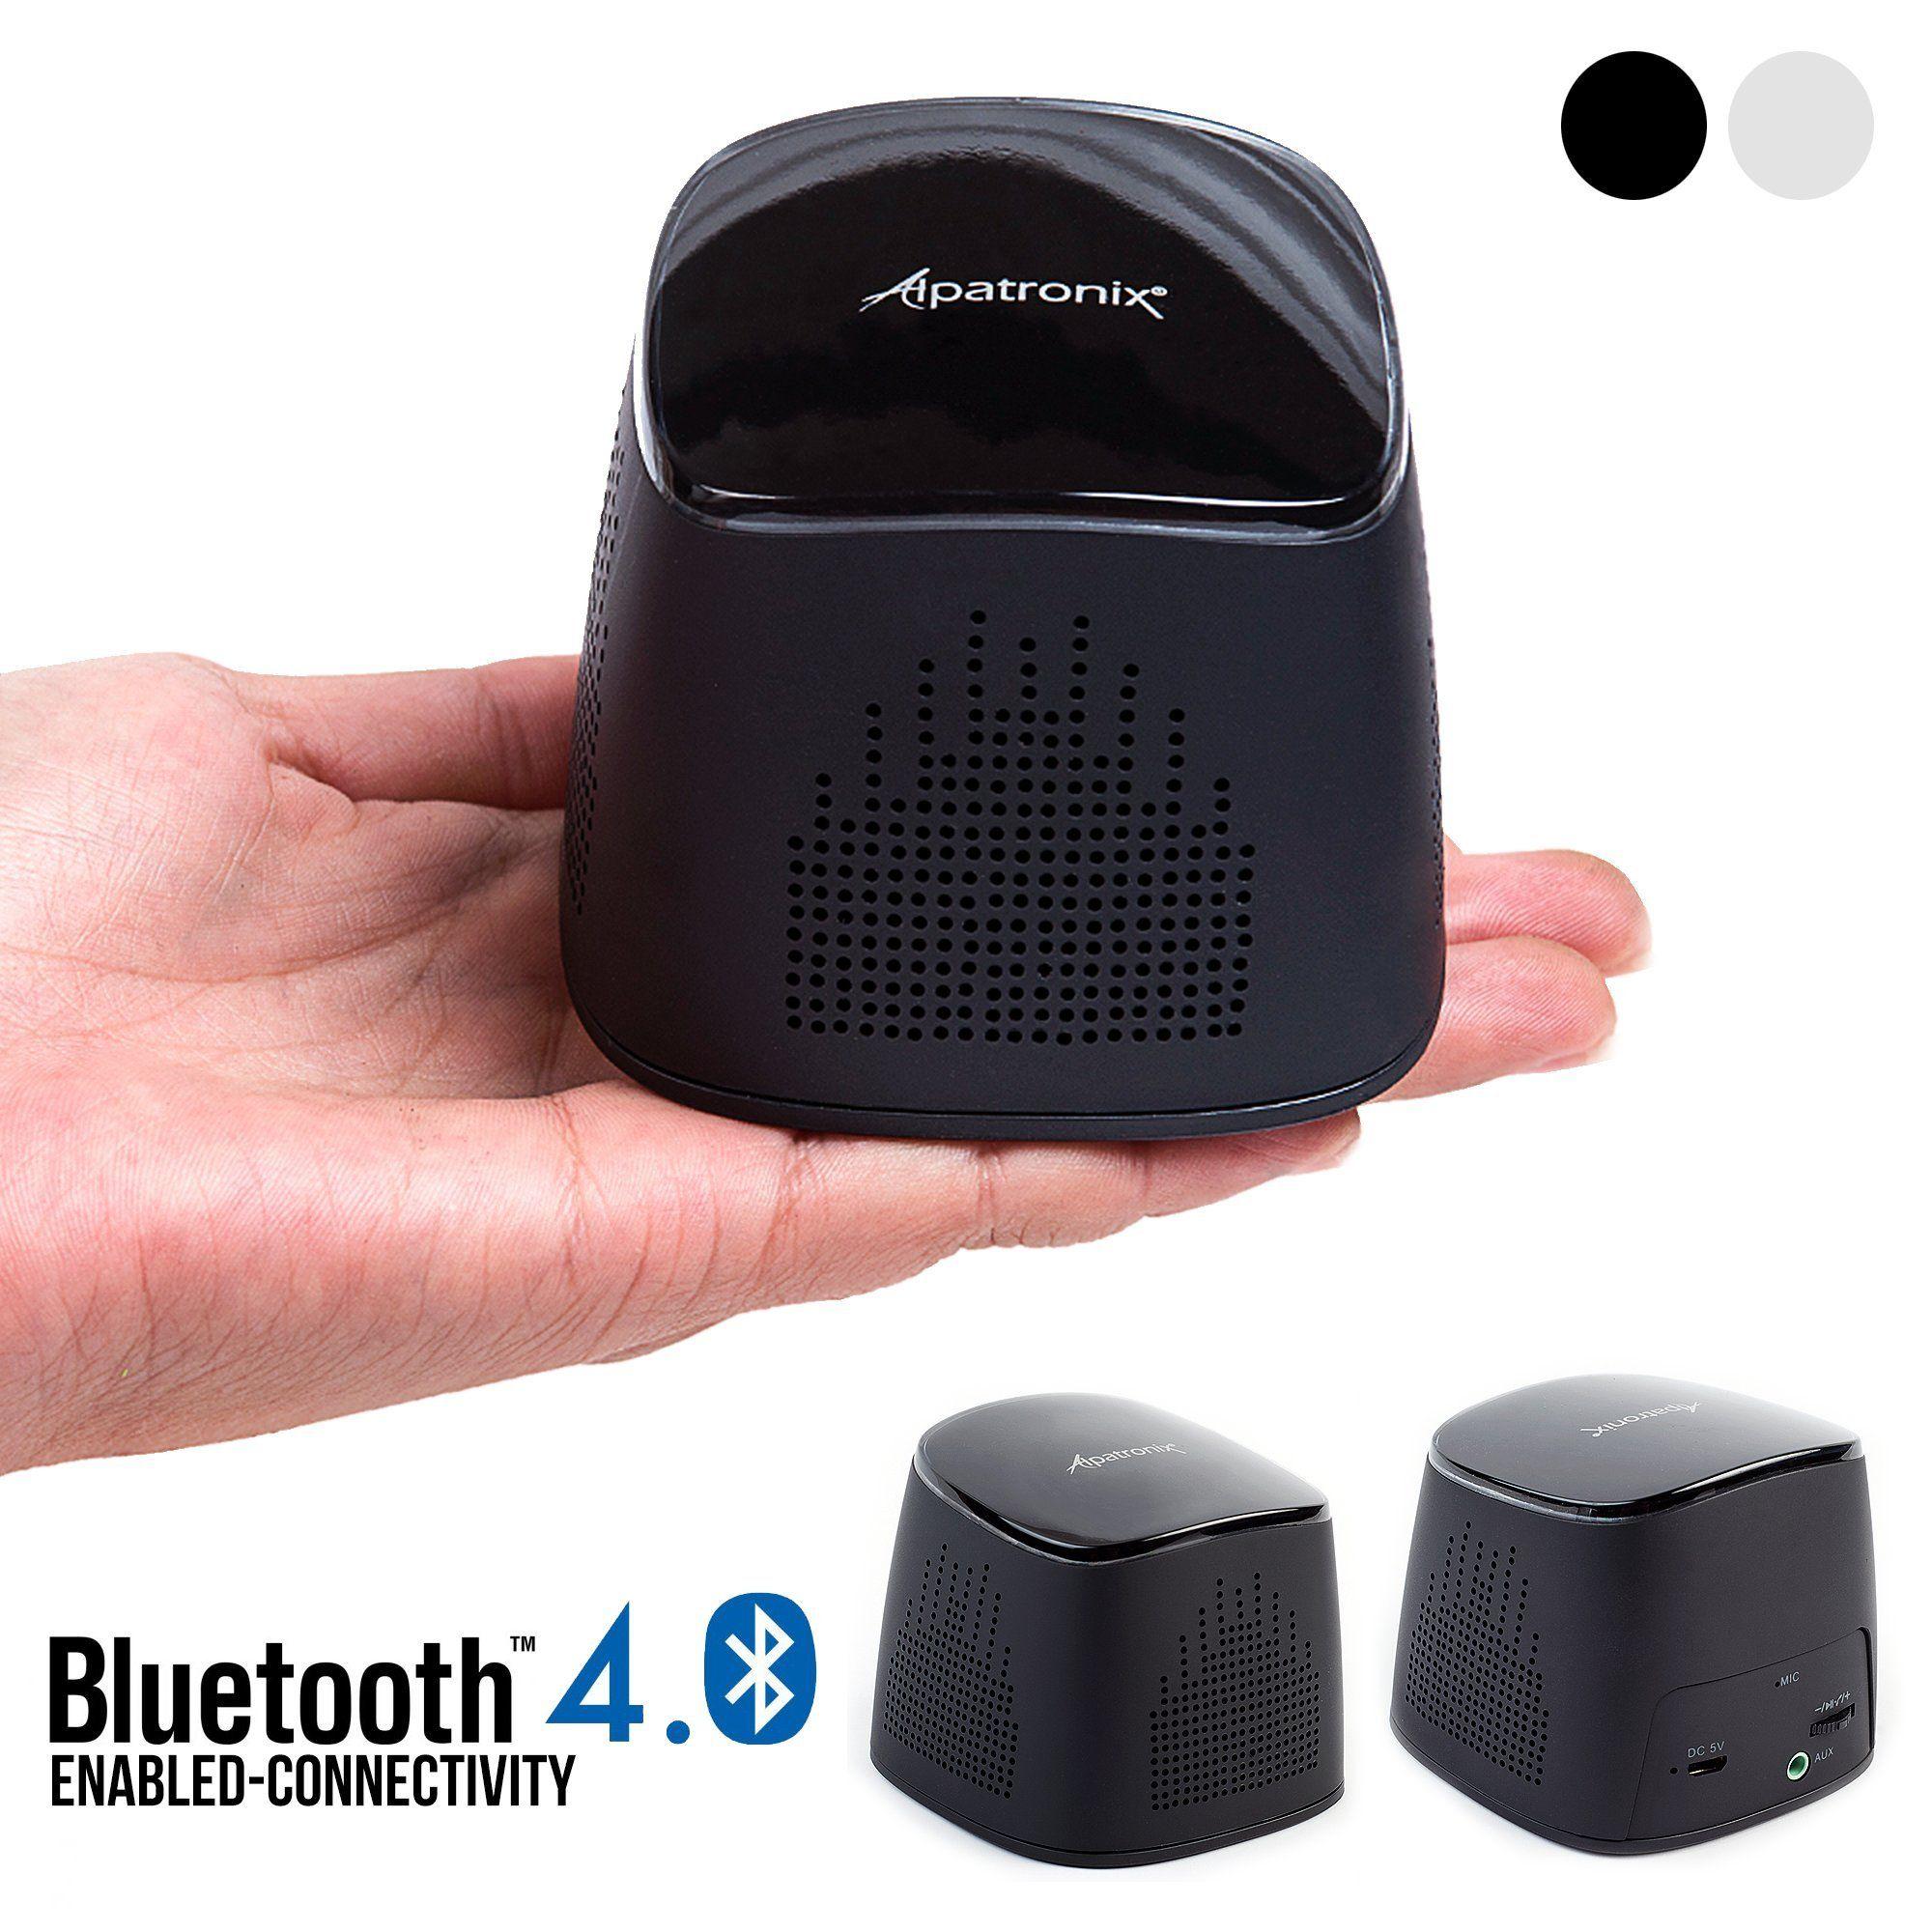 medium resolution of bluetooth speaker alpatronix ax310 ultra portable mini bluetooth wireless rechargeable speaker with mic